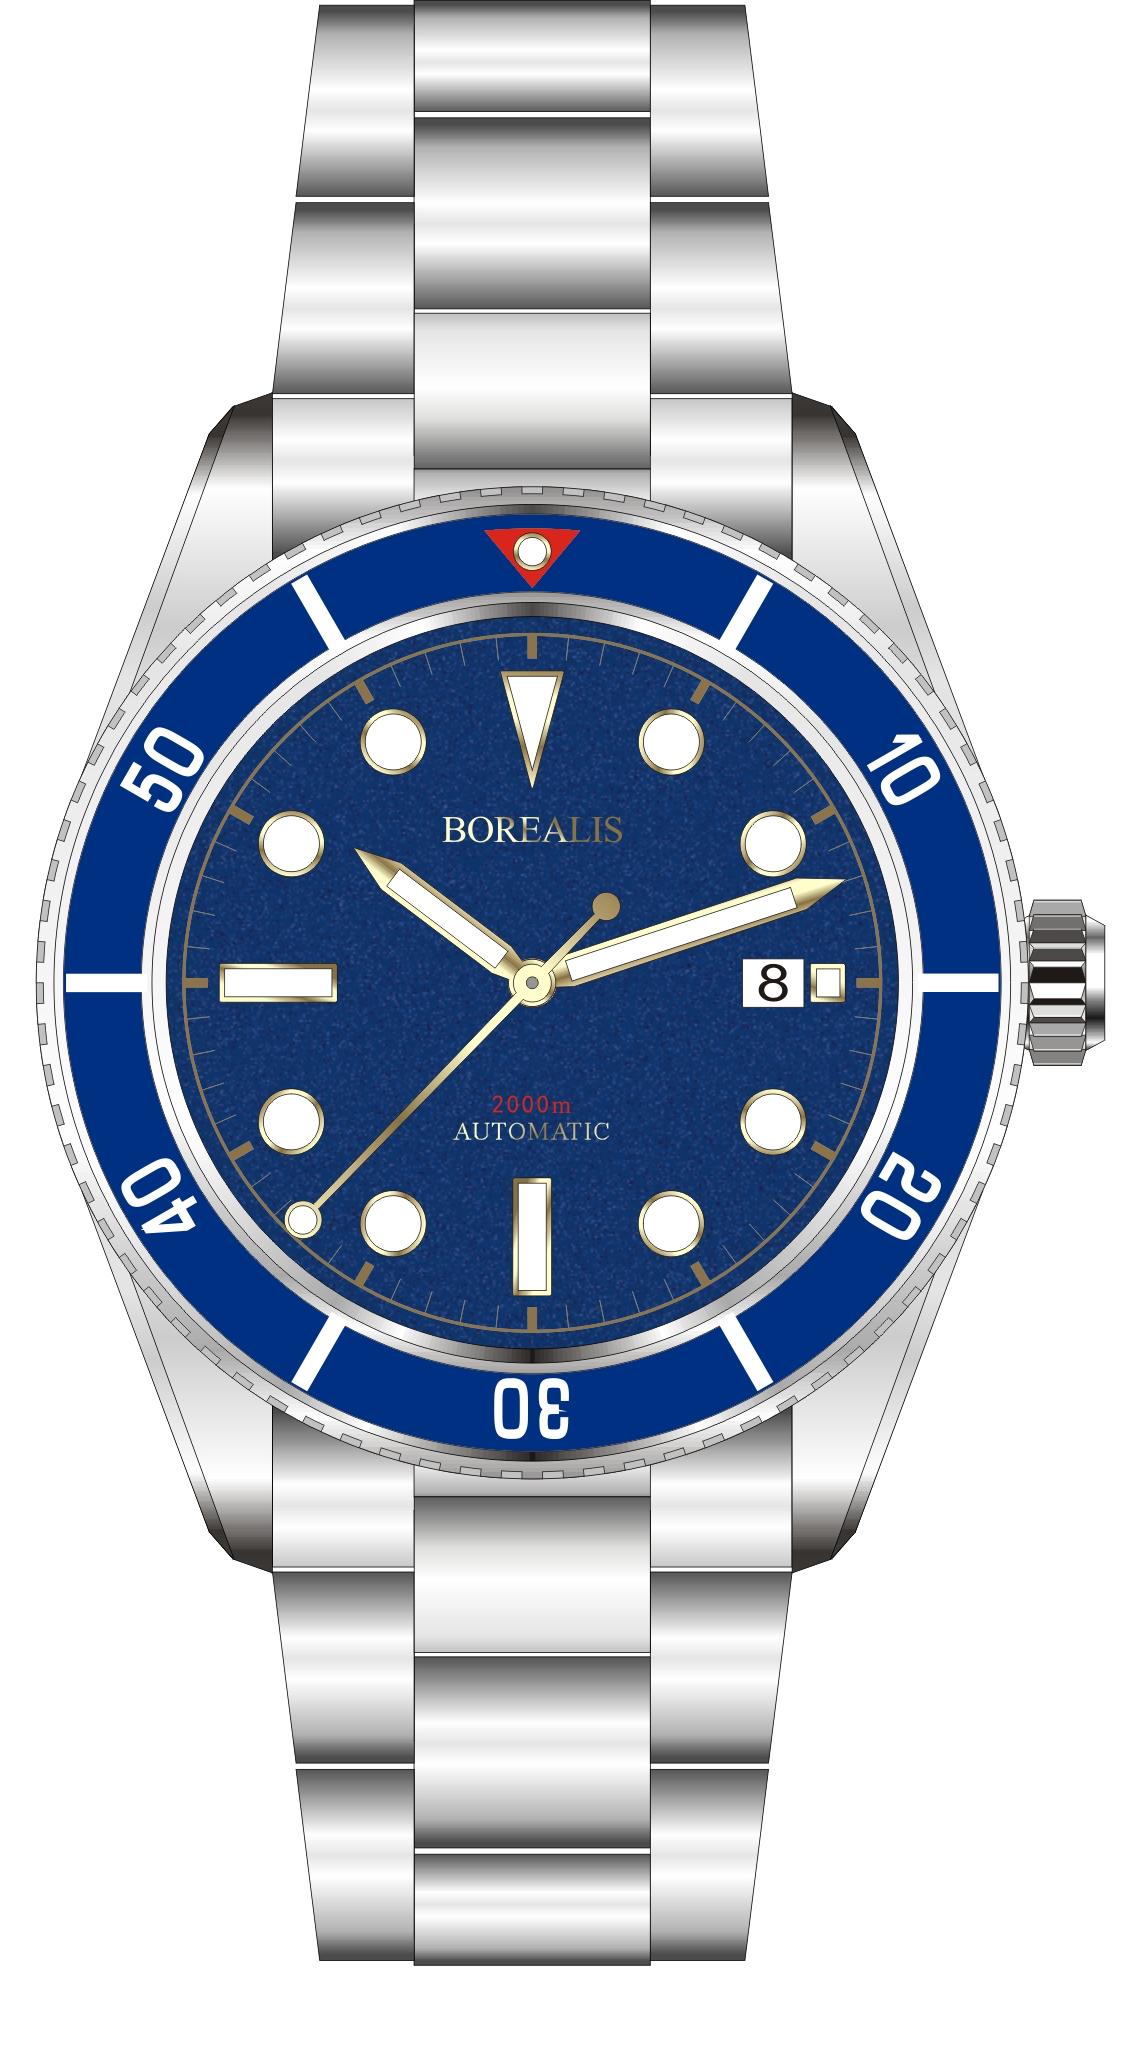 Borealis Bull Shark Automatic Diver Watch Date Miyota 9015 Ceramic Blue Bezel Blue Dial BBSBLBBLDD